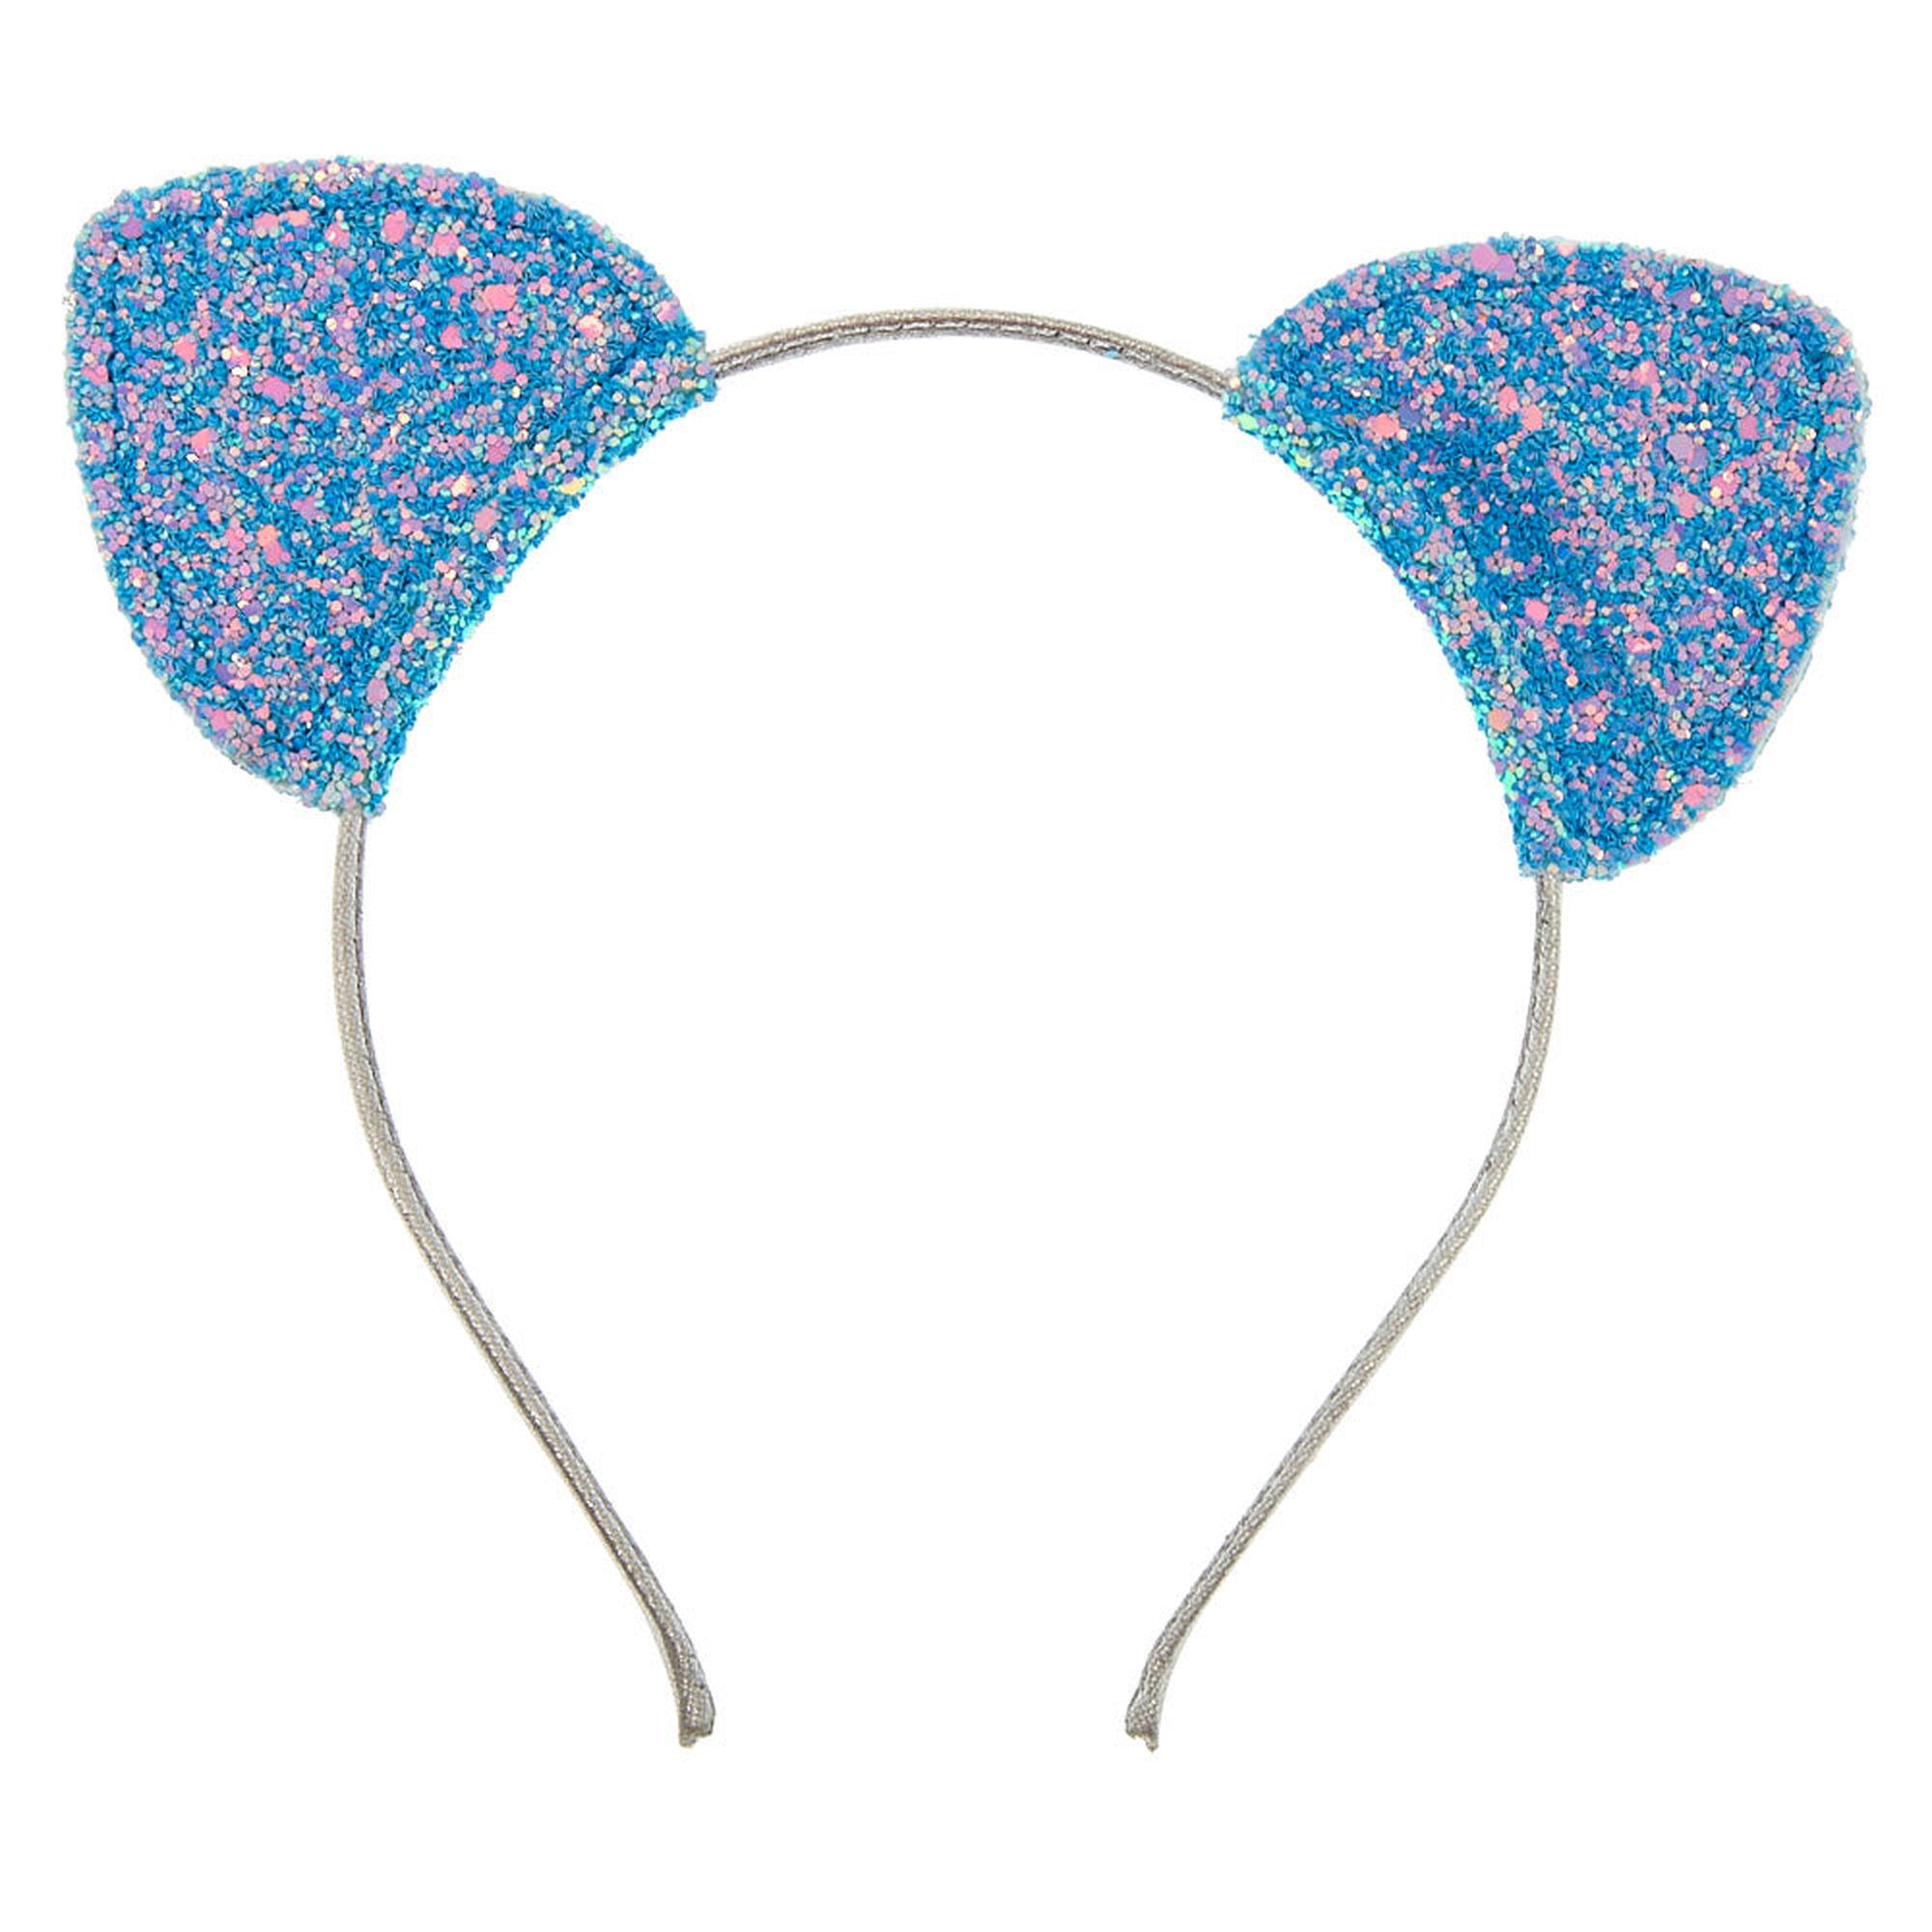 Baby Blue Glitter Cat Ears Headband Claire S Us Glitter Cat Ears Cat Ears Headband Blue Glitter